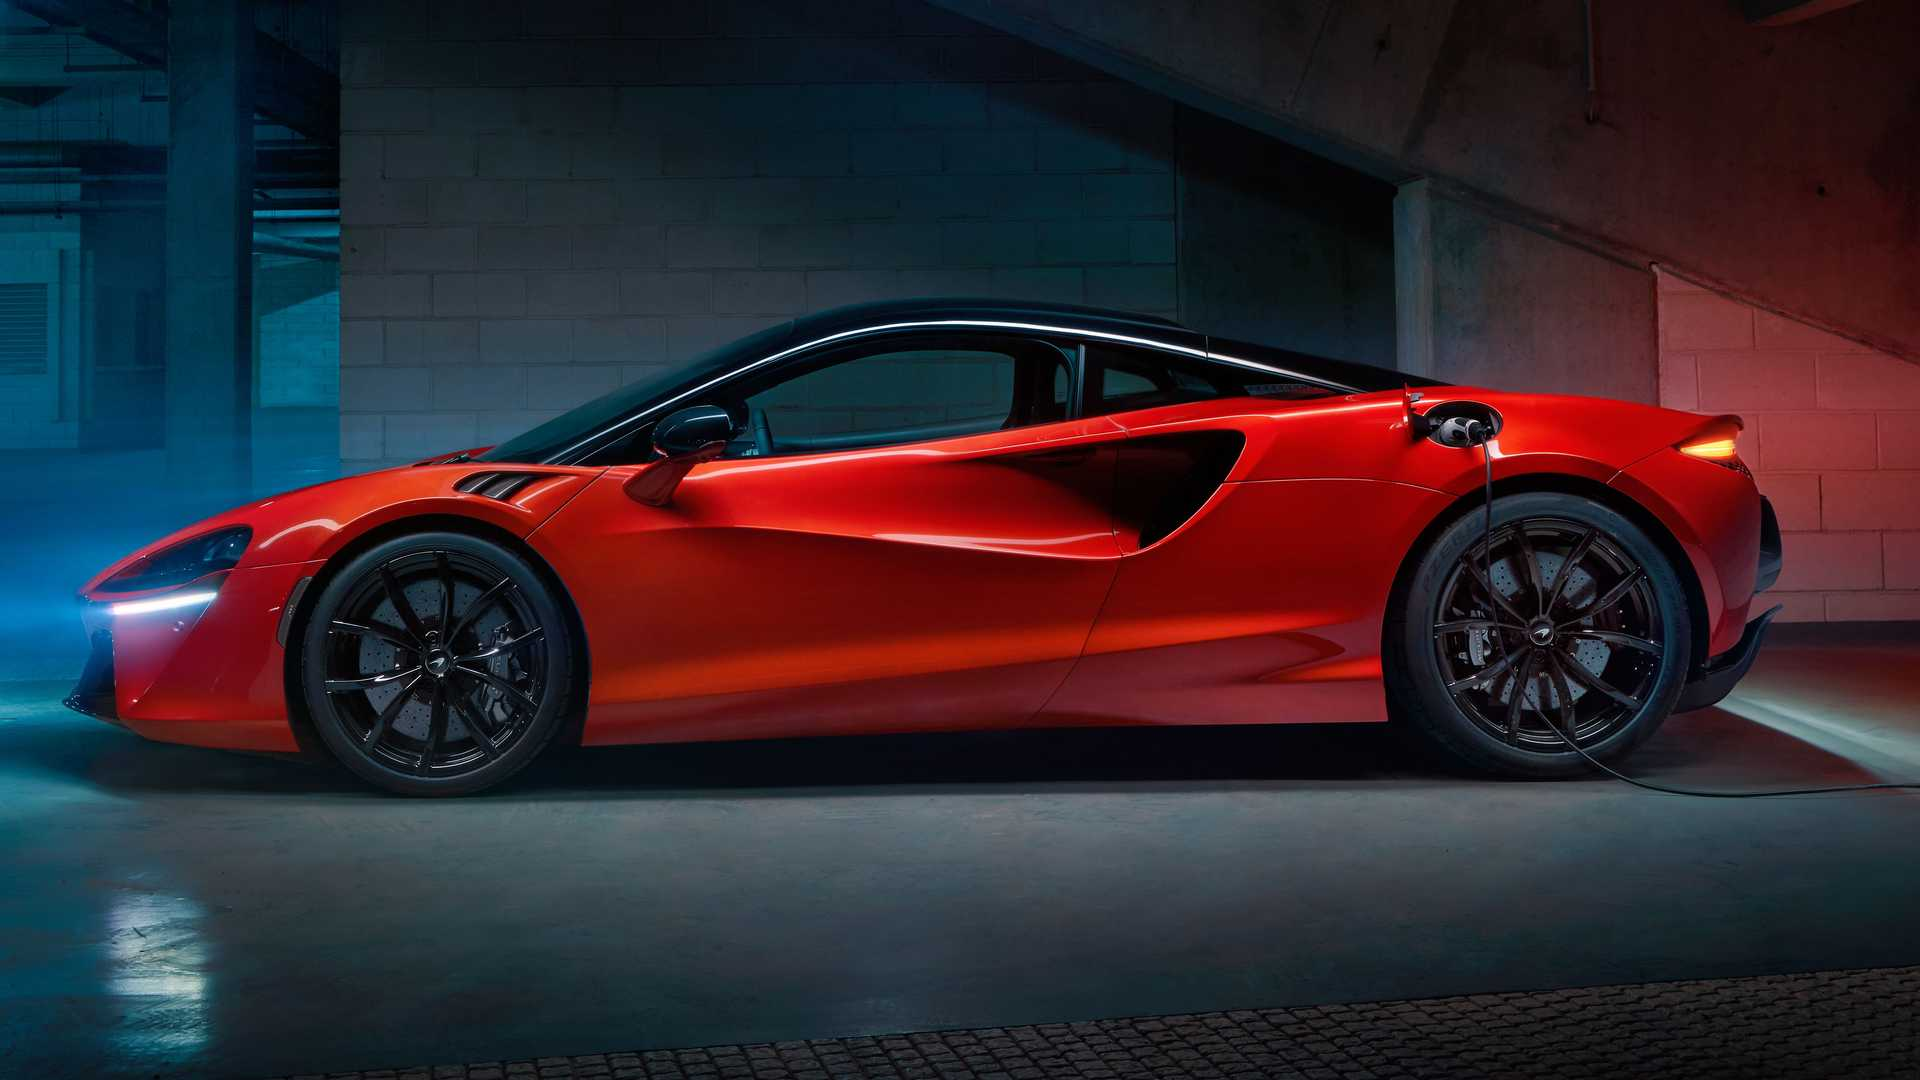 2022 McLaren Artura Side Inside